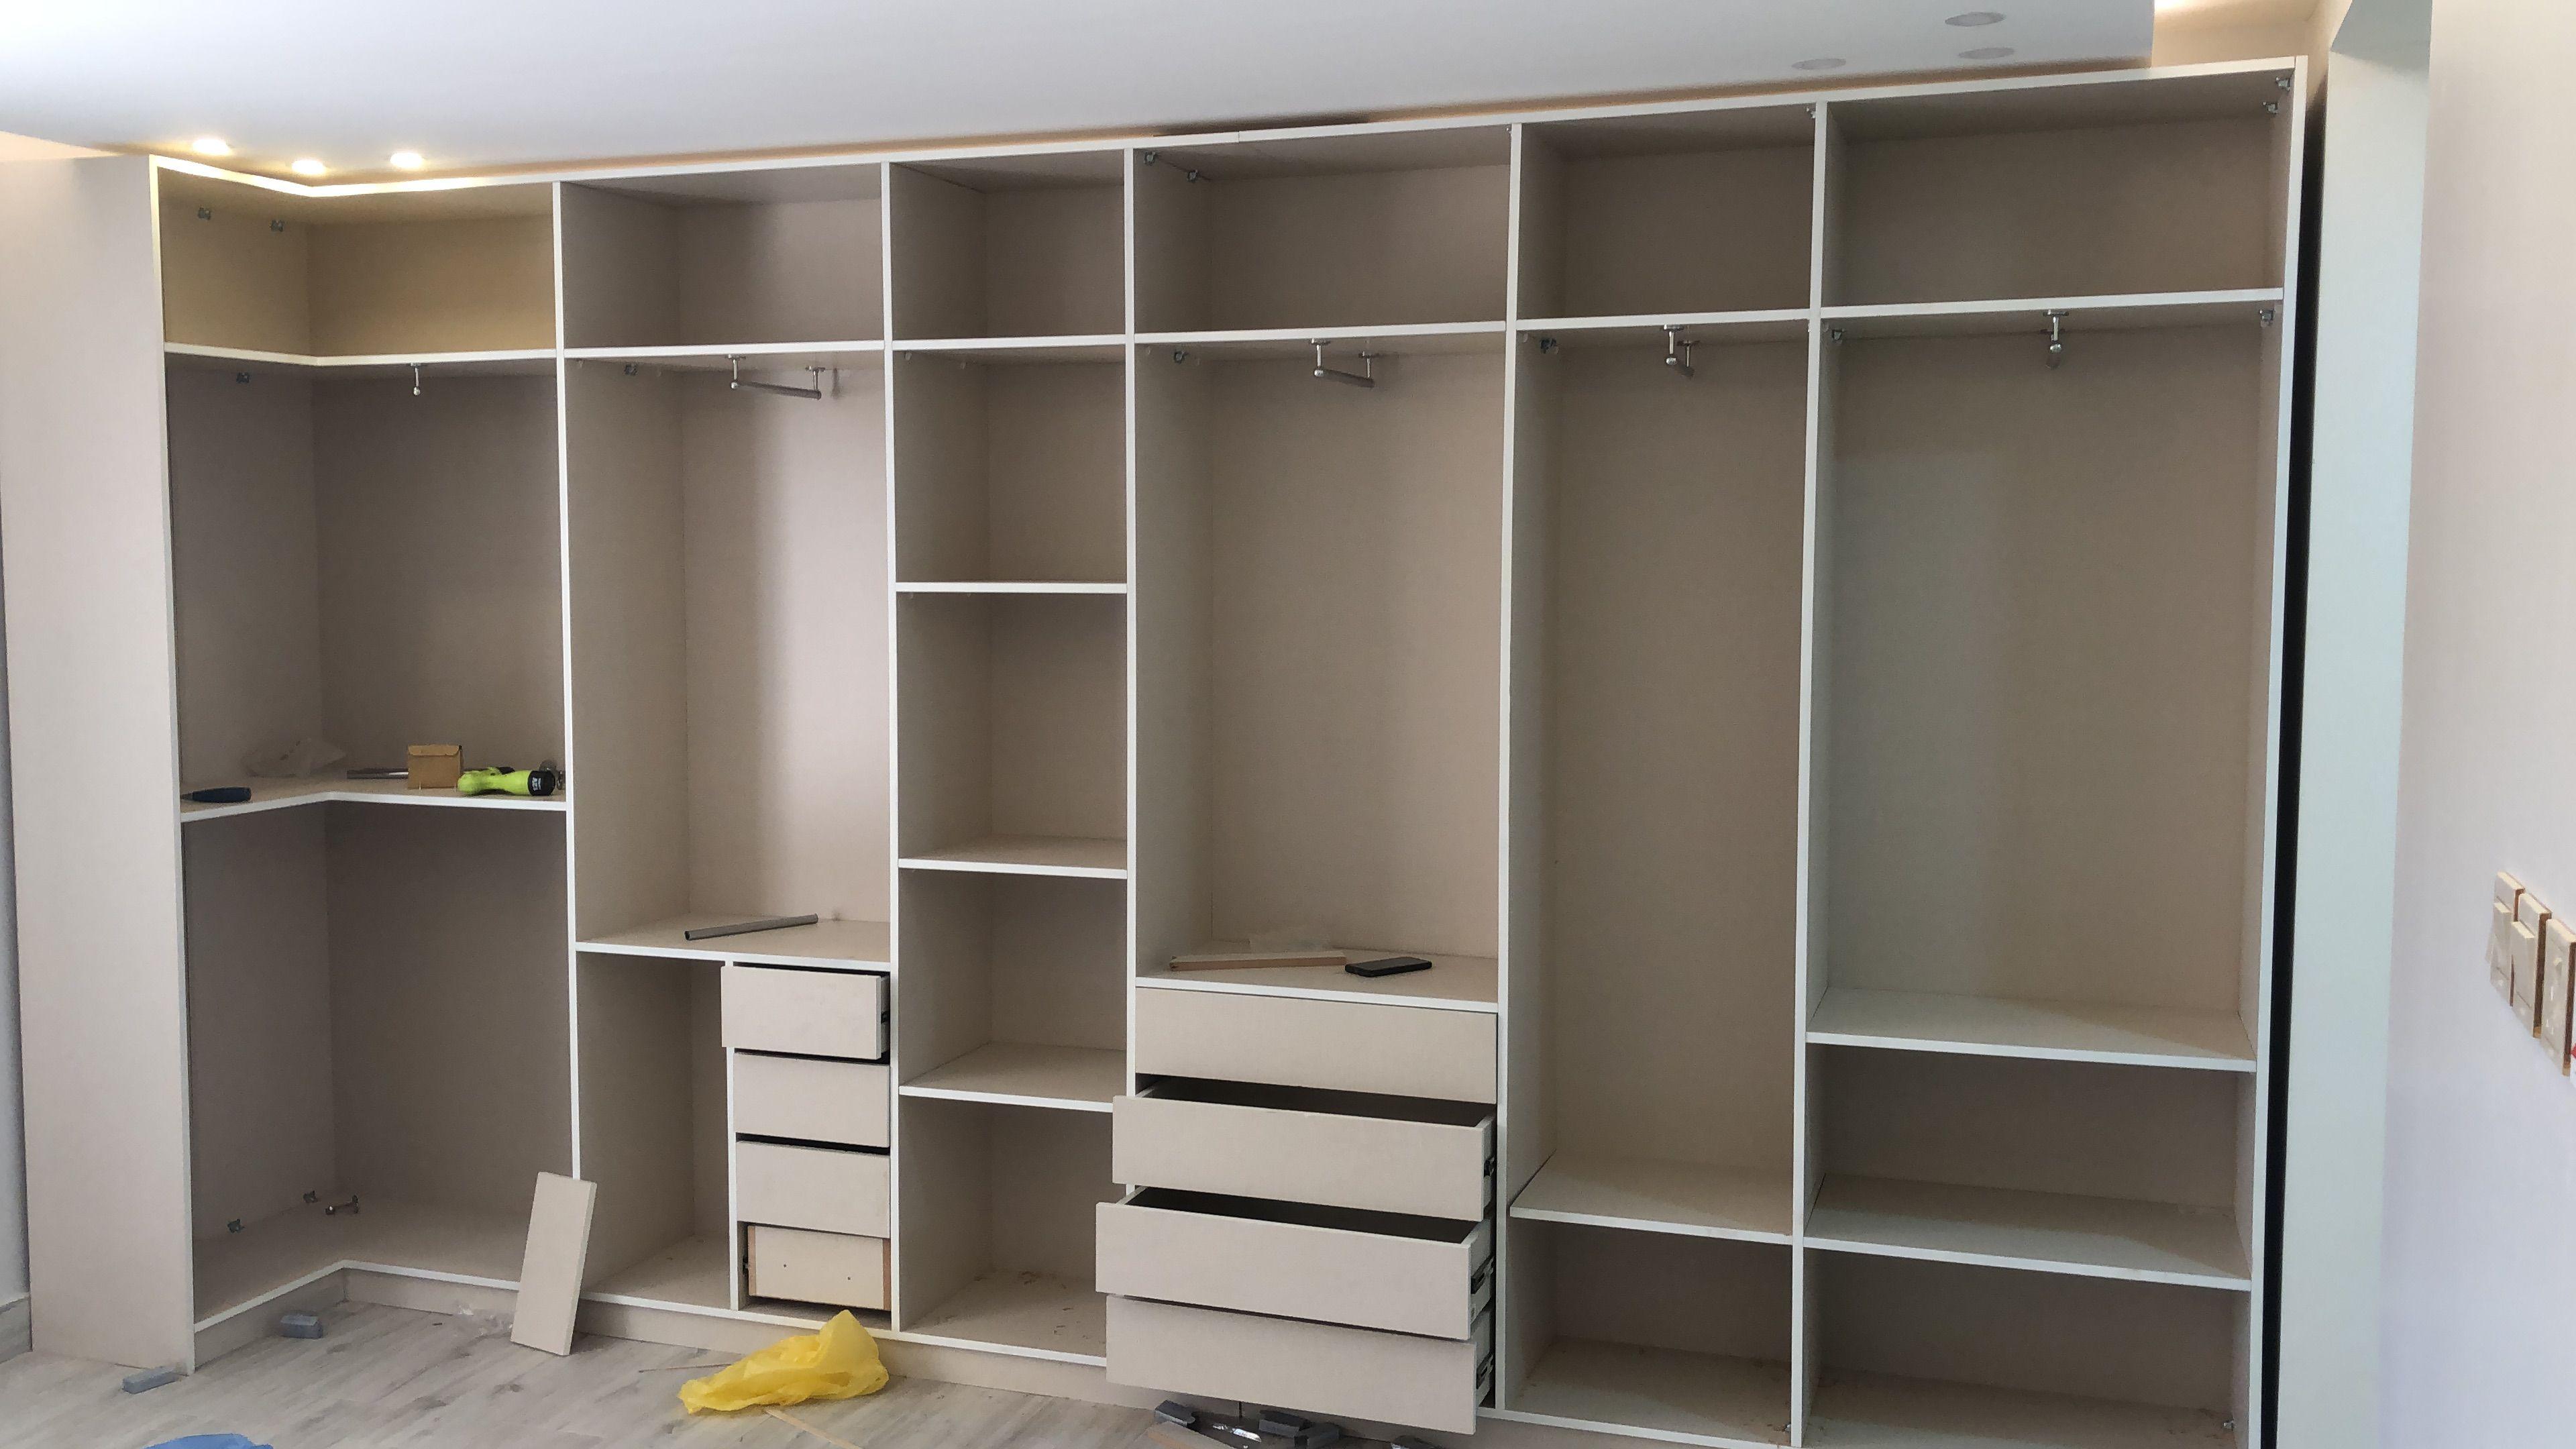 دولاب ملابس بدون باب Shelving Unit Shelving Shelves